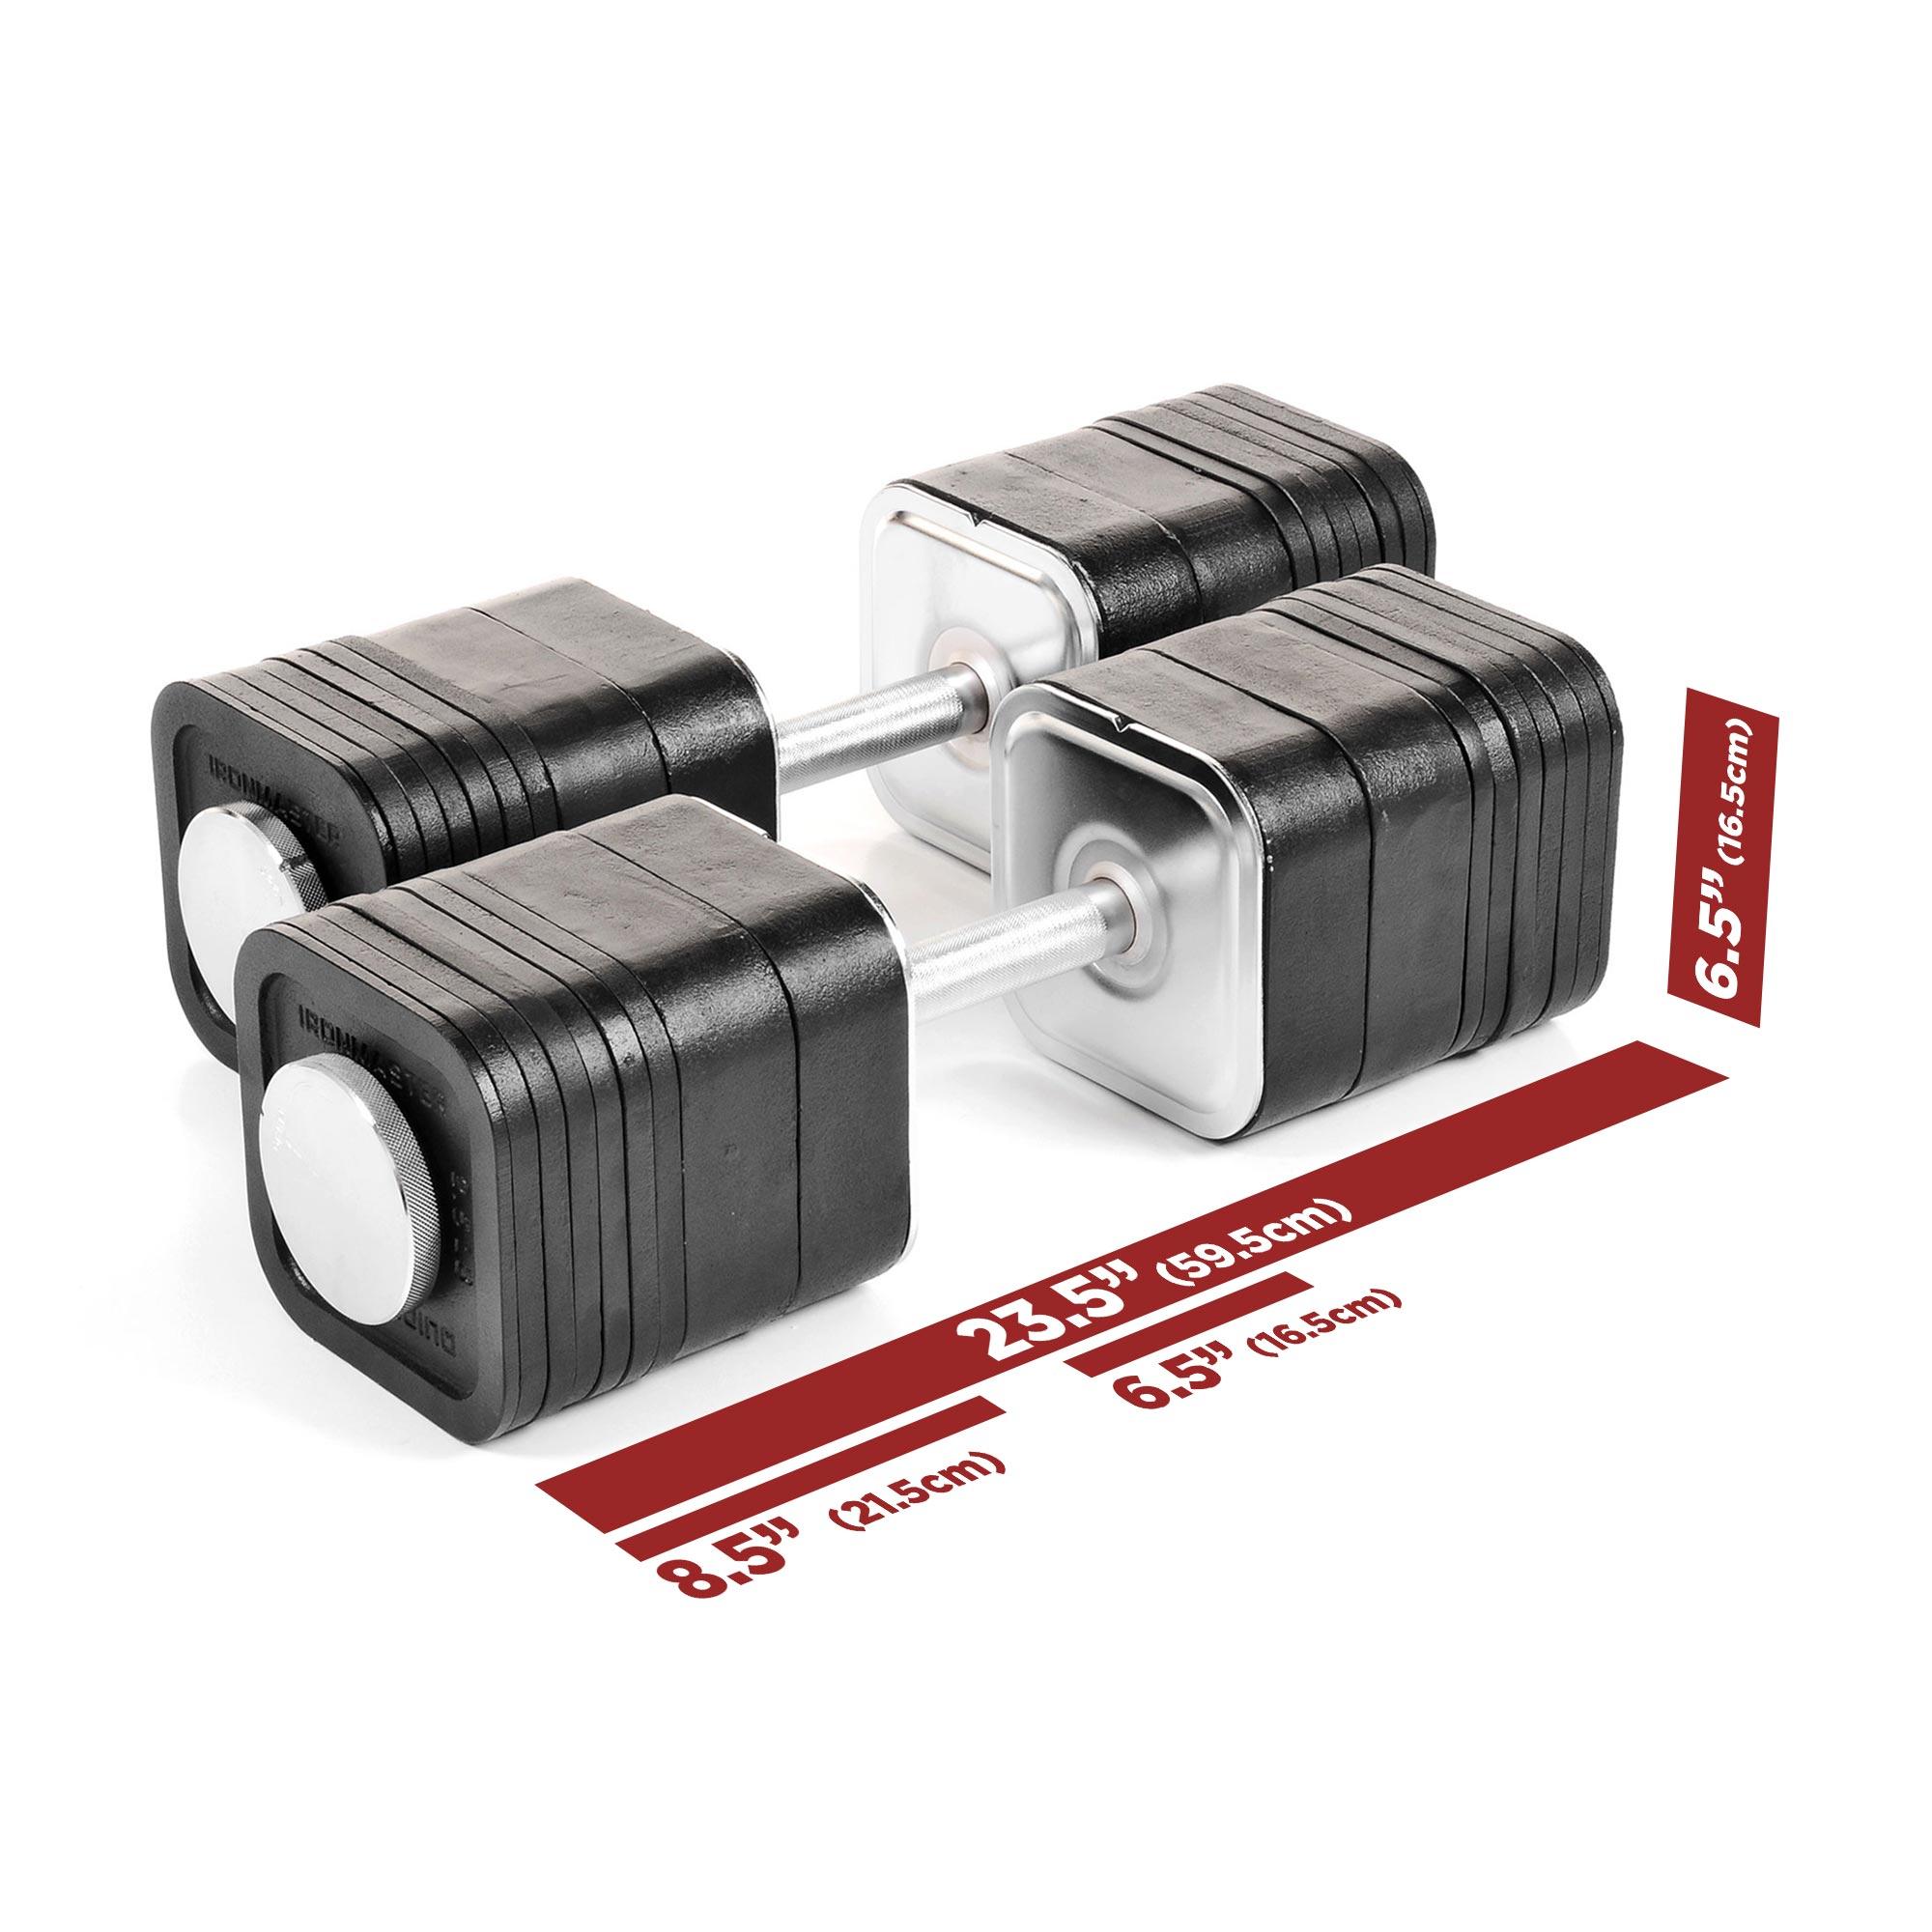 IronmasterUK QL Dumbbells 165lbs specifications